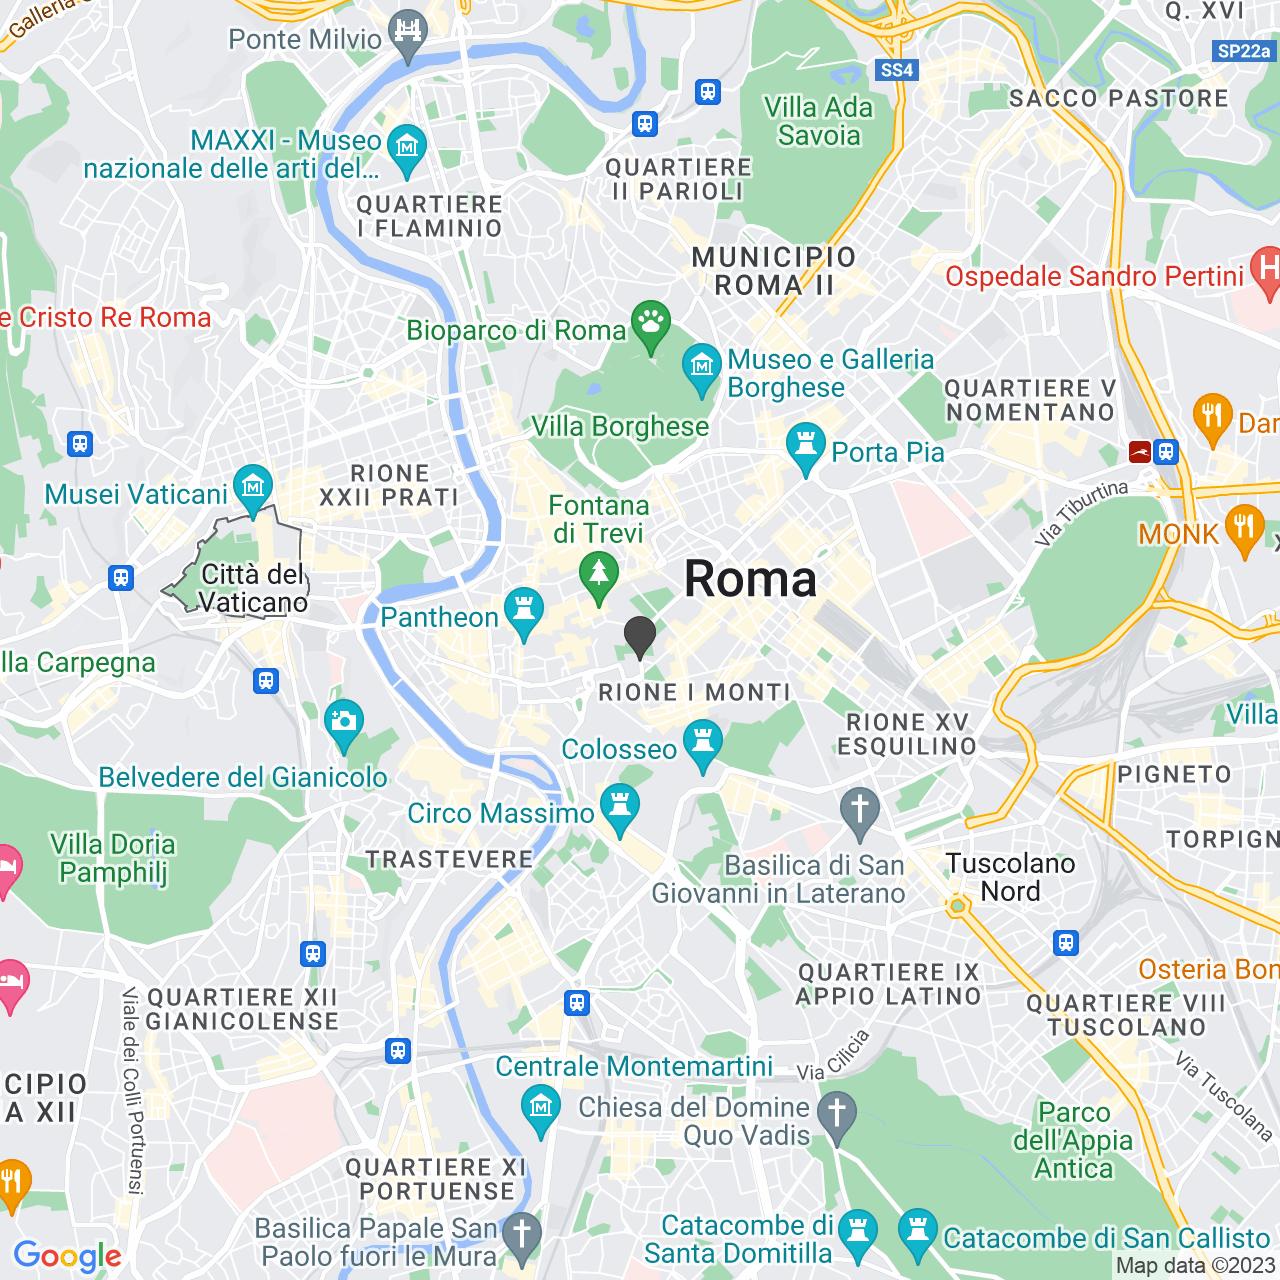 ASSOCIAZIONE SAN GIUSEPPE MOSCATI - ONLUS